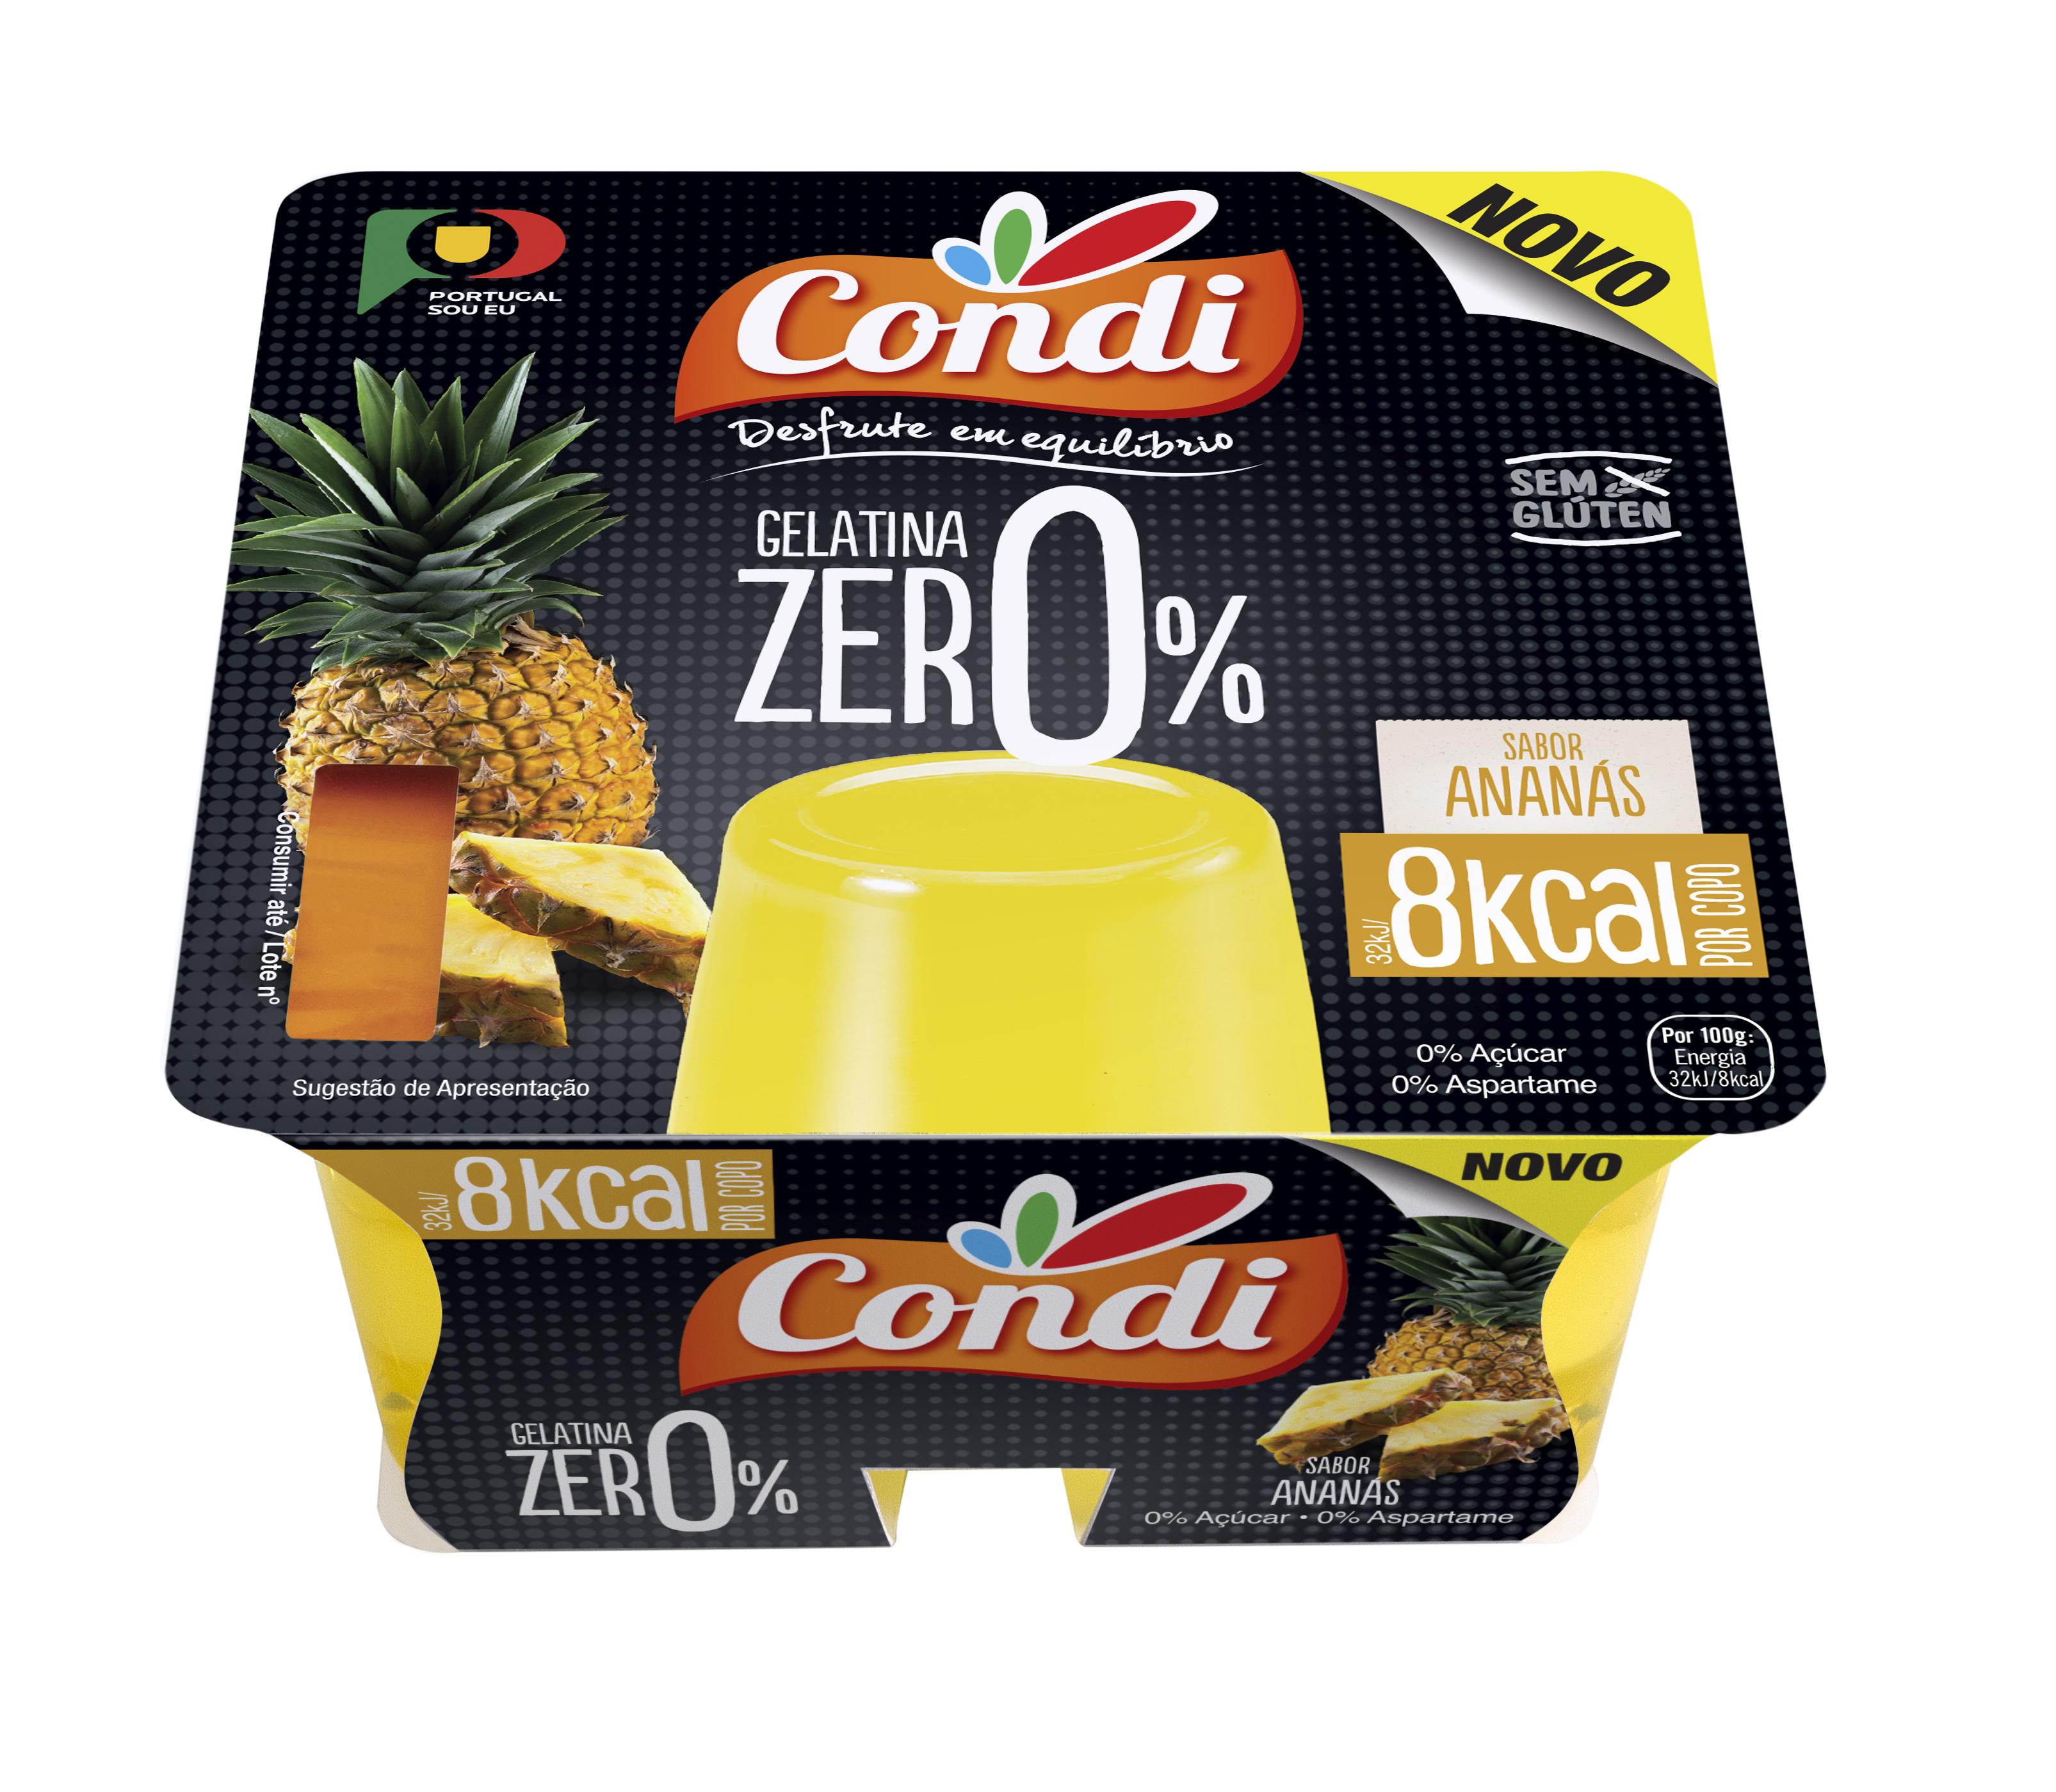 Gelatina Zero Pronta a Comer (Ananás) - PVP 1.94€